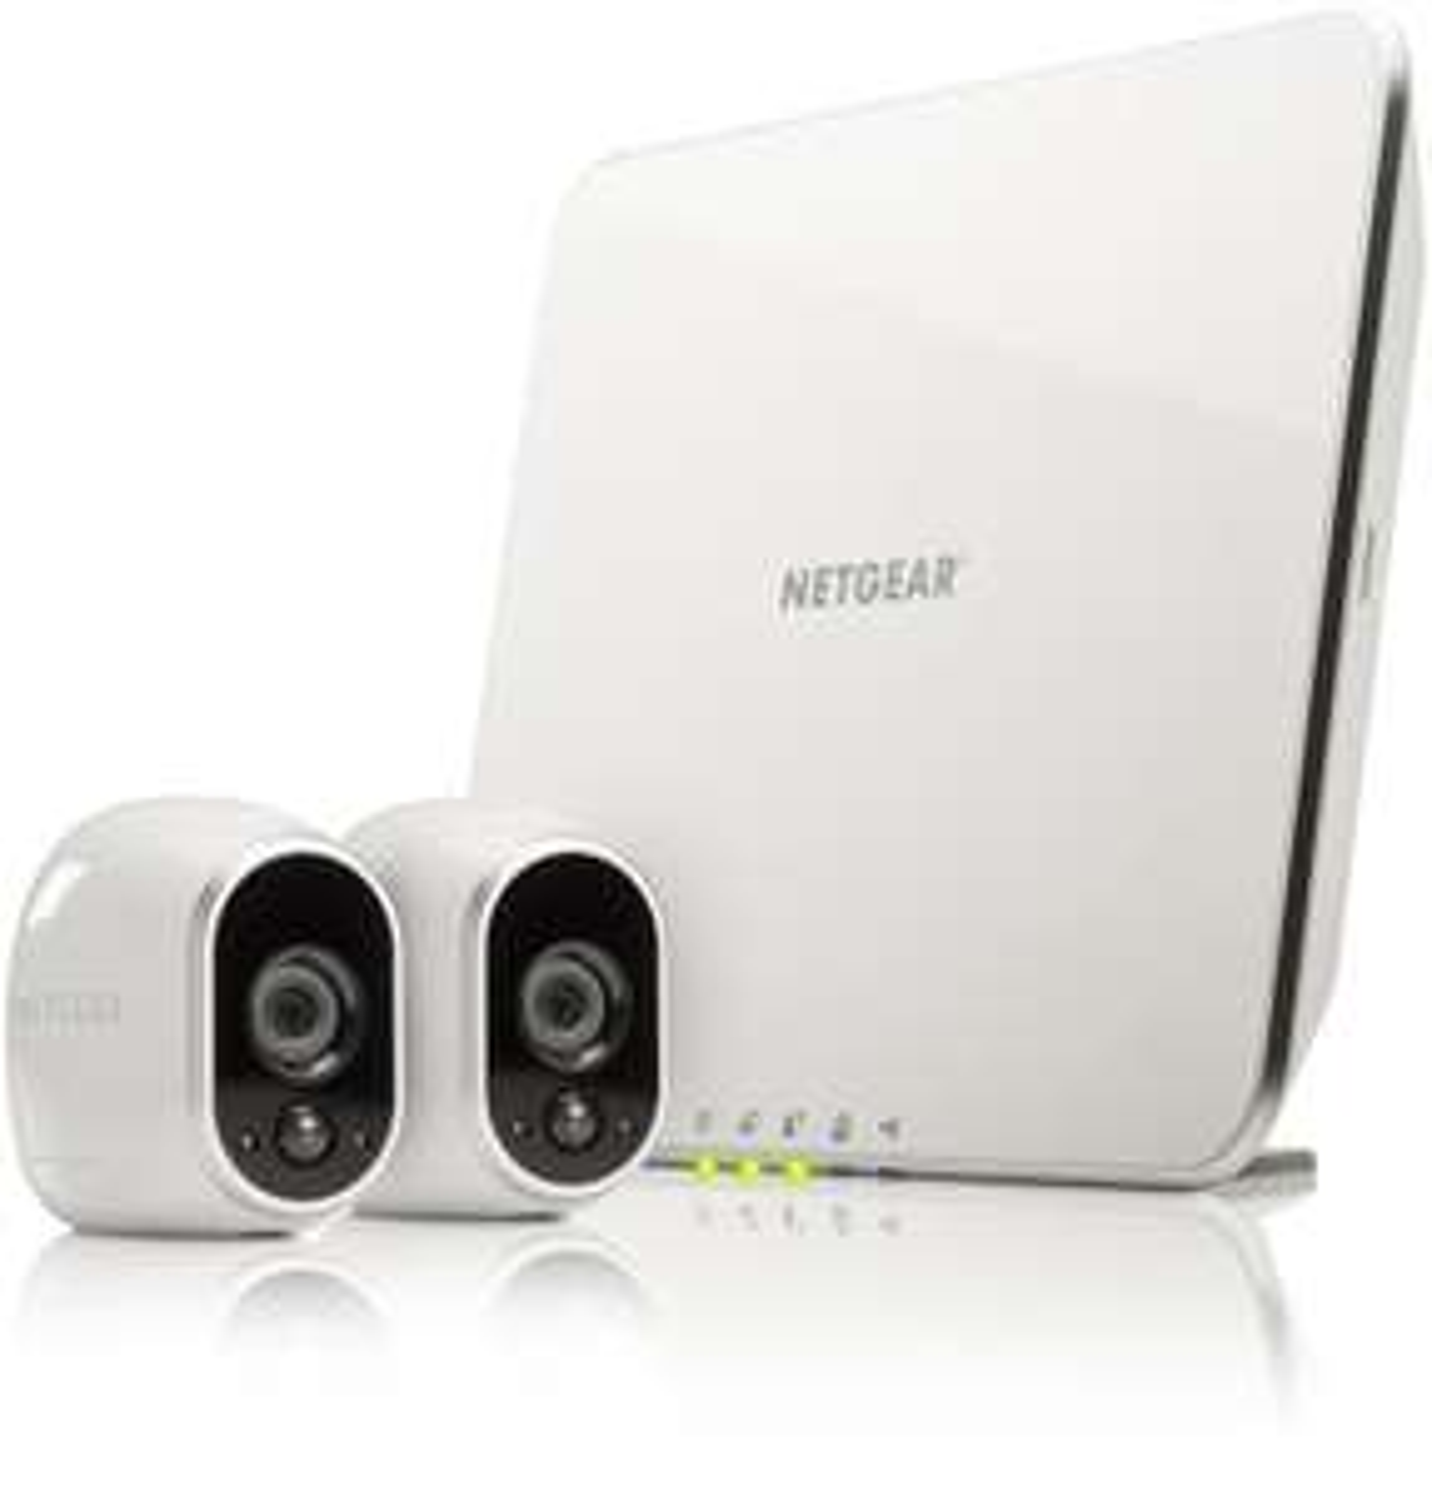 Kit de Surveillance sans fil Netgear Arlo avec 2 Caméras HD